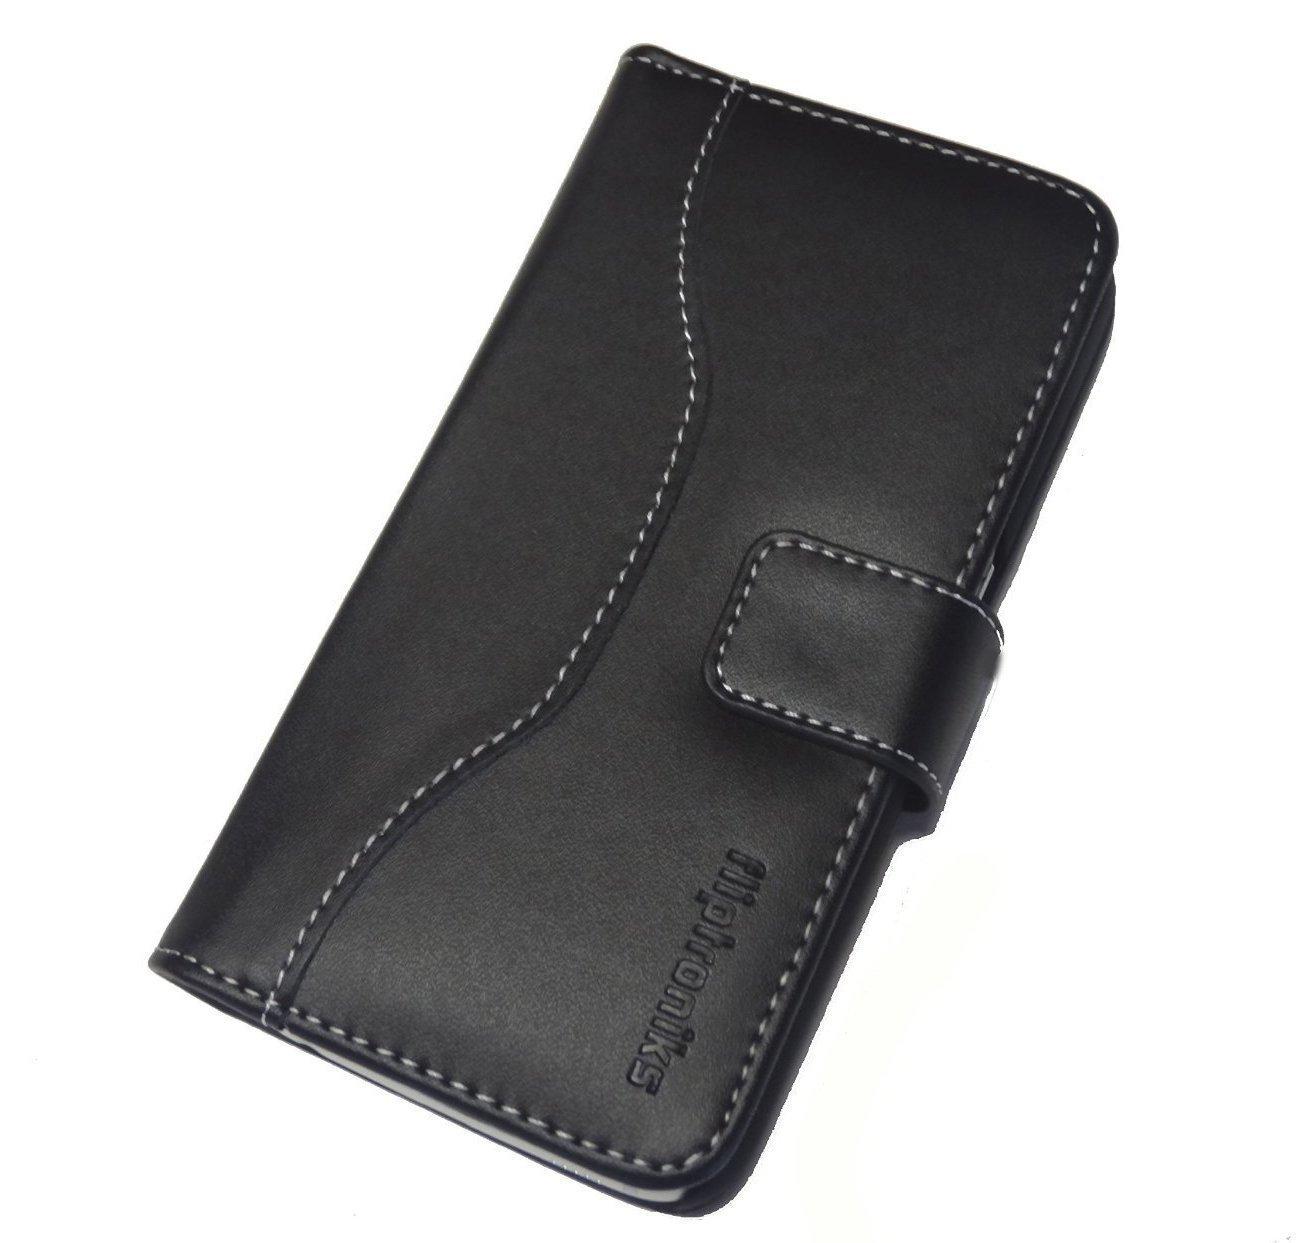 Fliptroniks Galaxy Note 4 Case Wallet Top Benefits